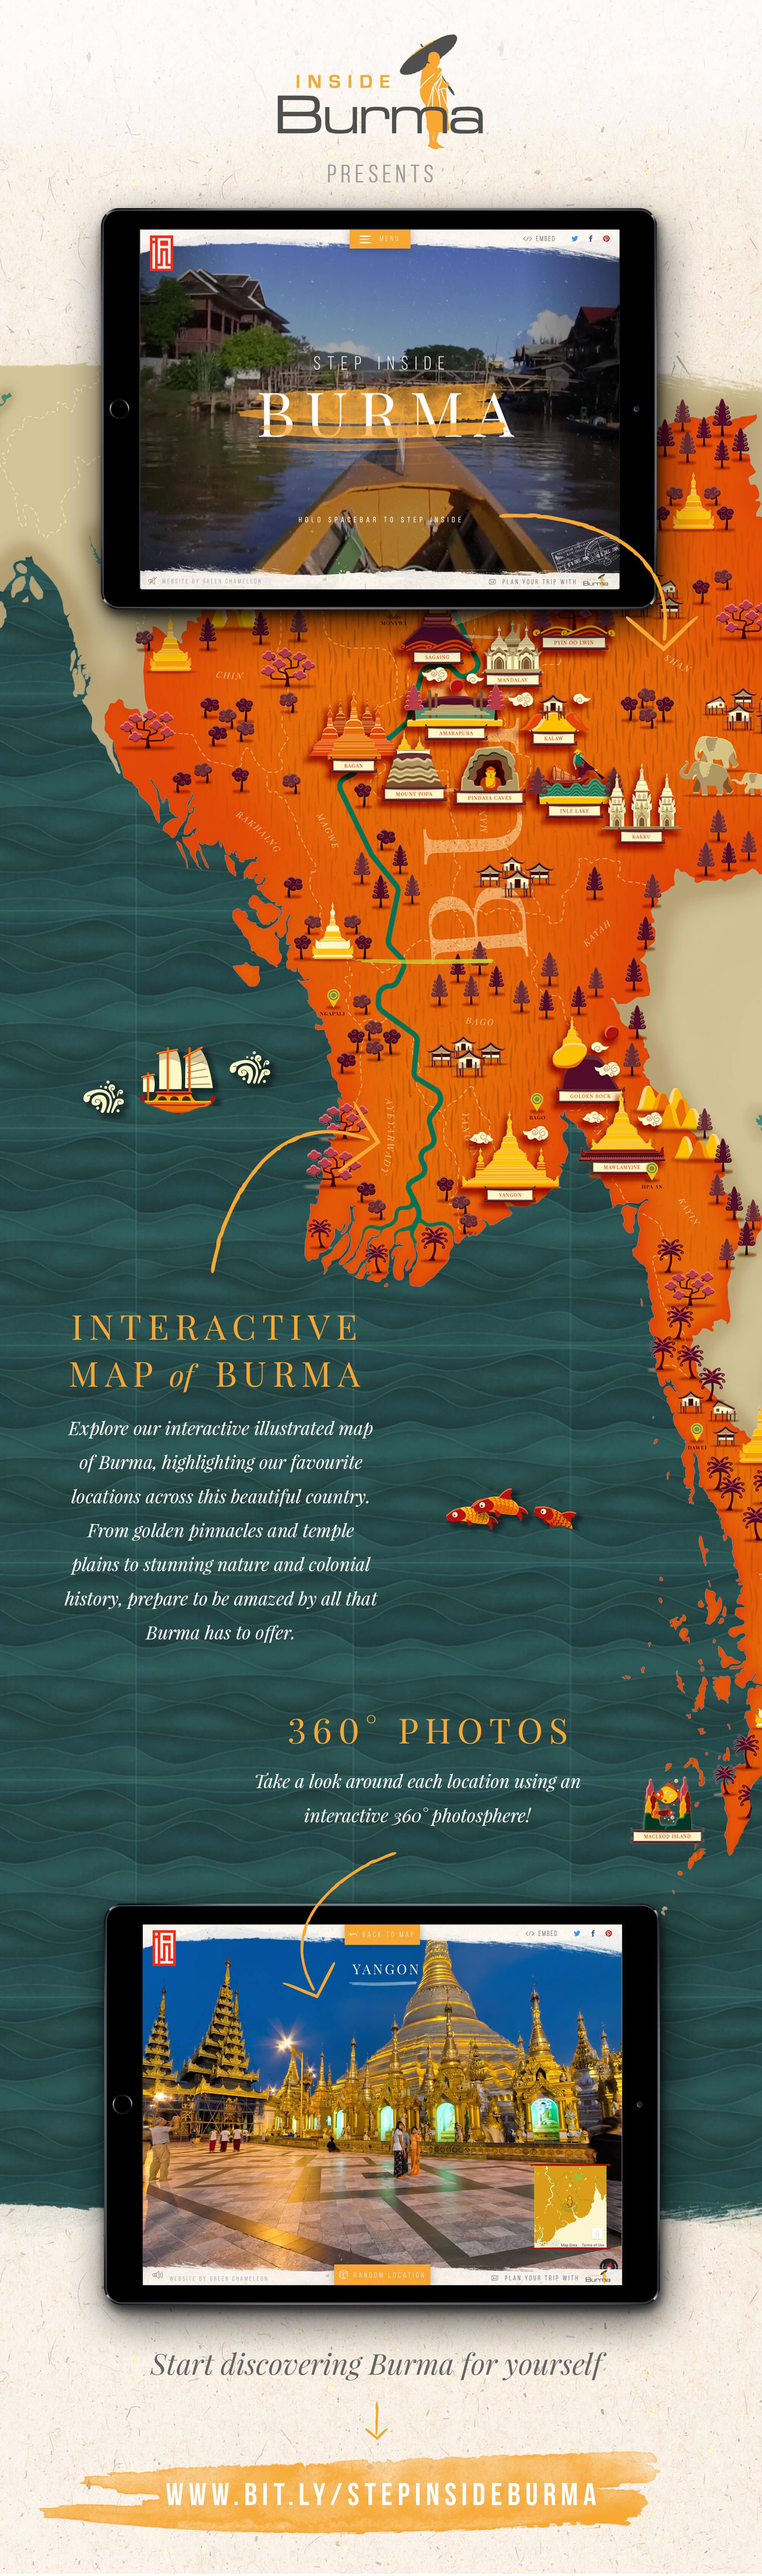 Stunning Interactive map of Myanmar